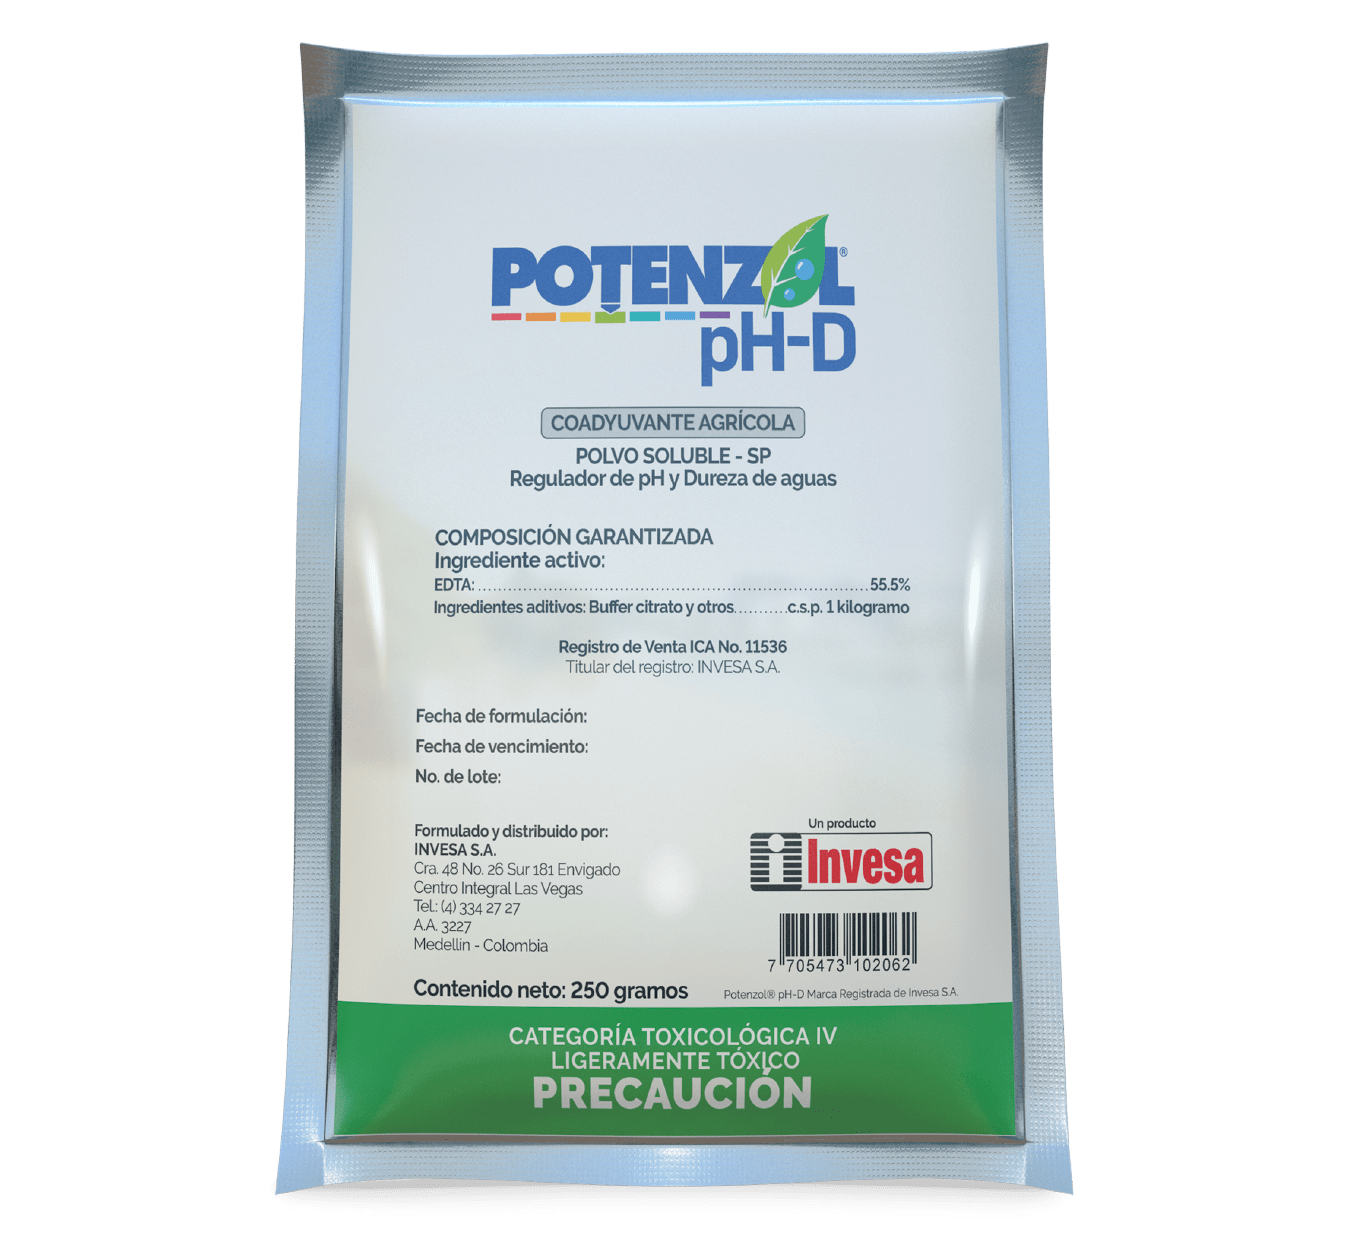 Potenzol-pHD-250g-01-min.png